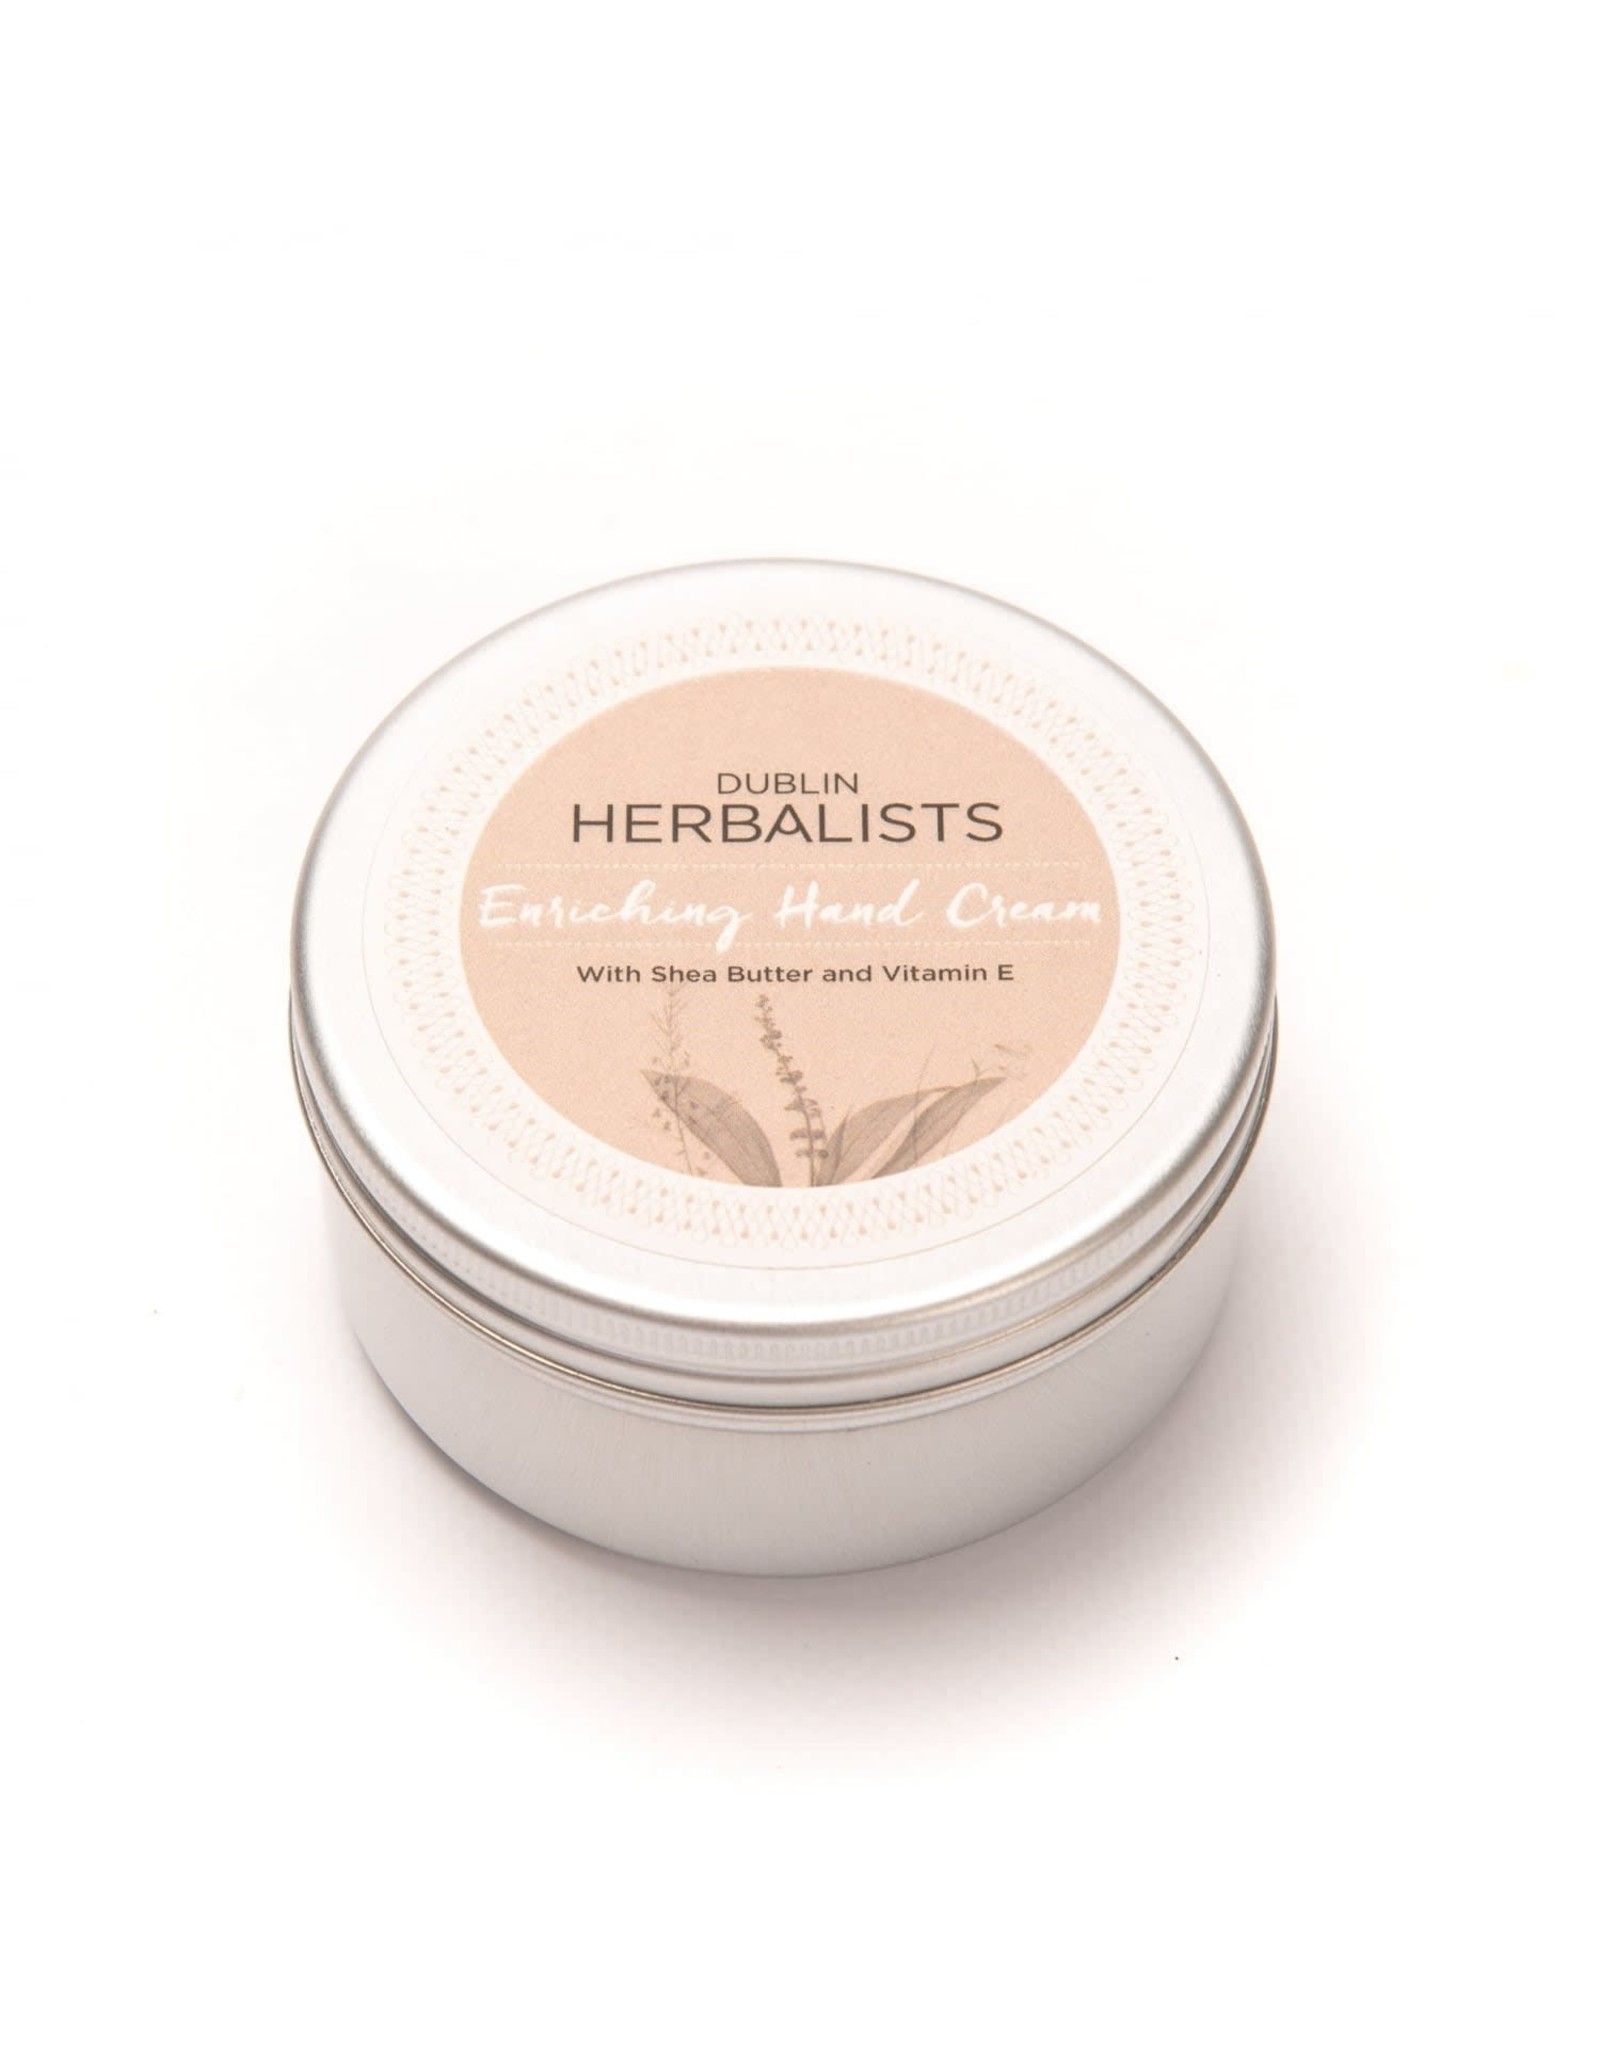 Dublin Herbalists Enriching Hand Cream with Lemongrass and Bergamot by Dublin Herbalists